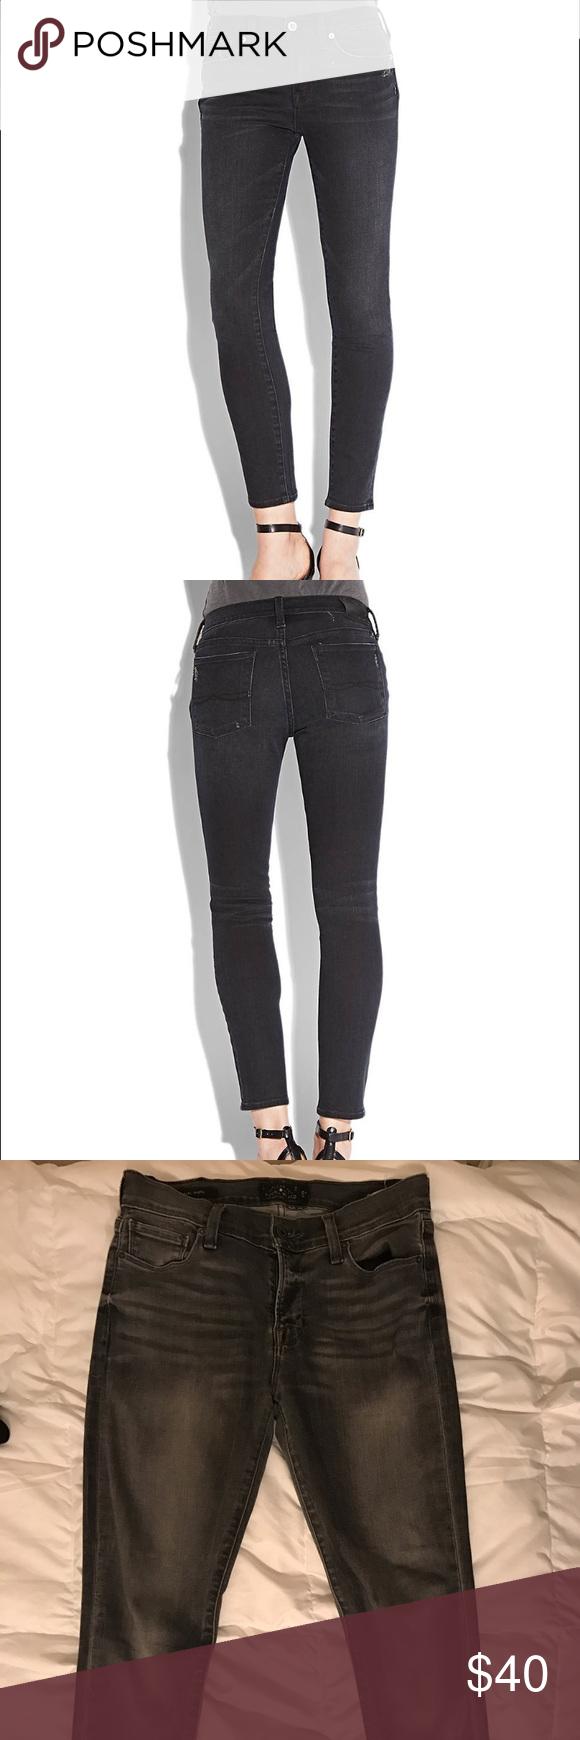 Lucky Brand faded black Brooke Skinny size 2/26 Lightly used, faded black skinny jean in size 2 Lucky Brand Jeans Skinny